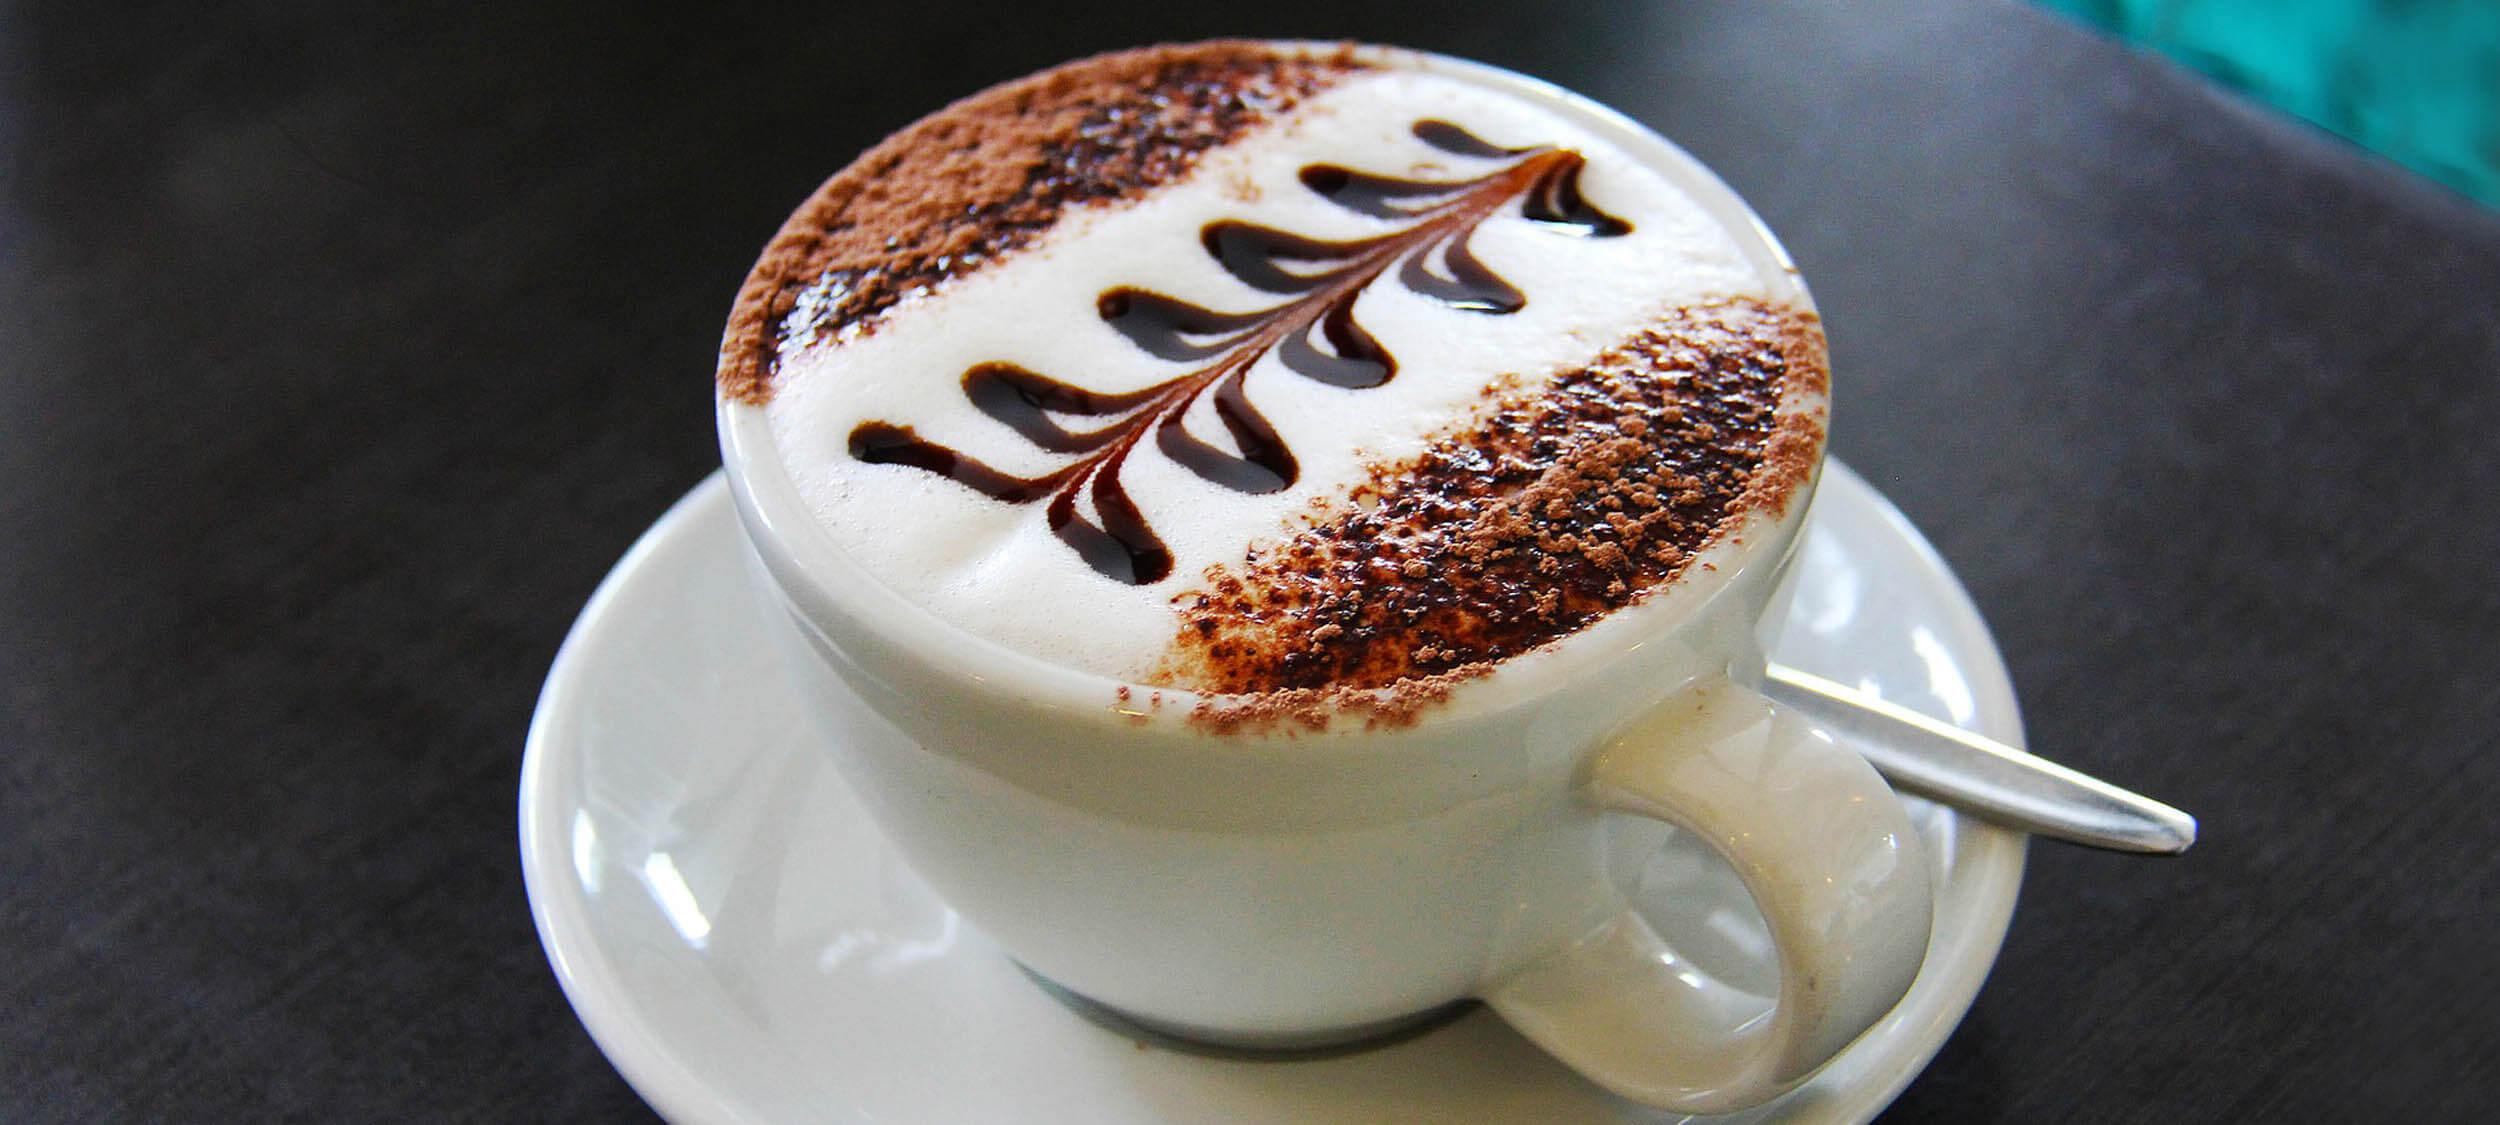 Tag des Kaffees – wir feiern das heiß-geliebte Getränk